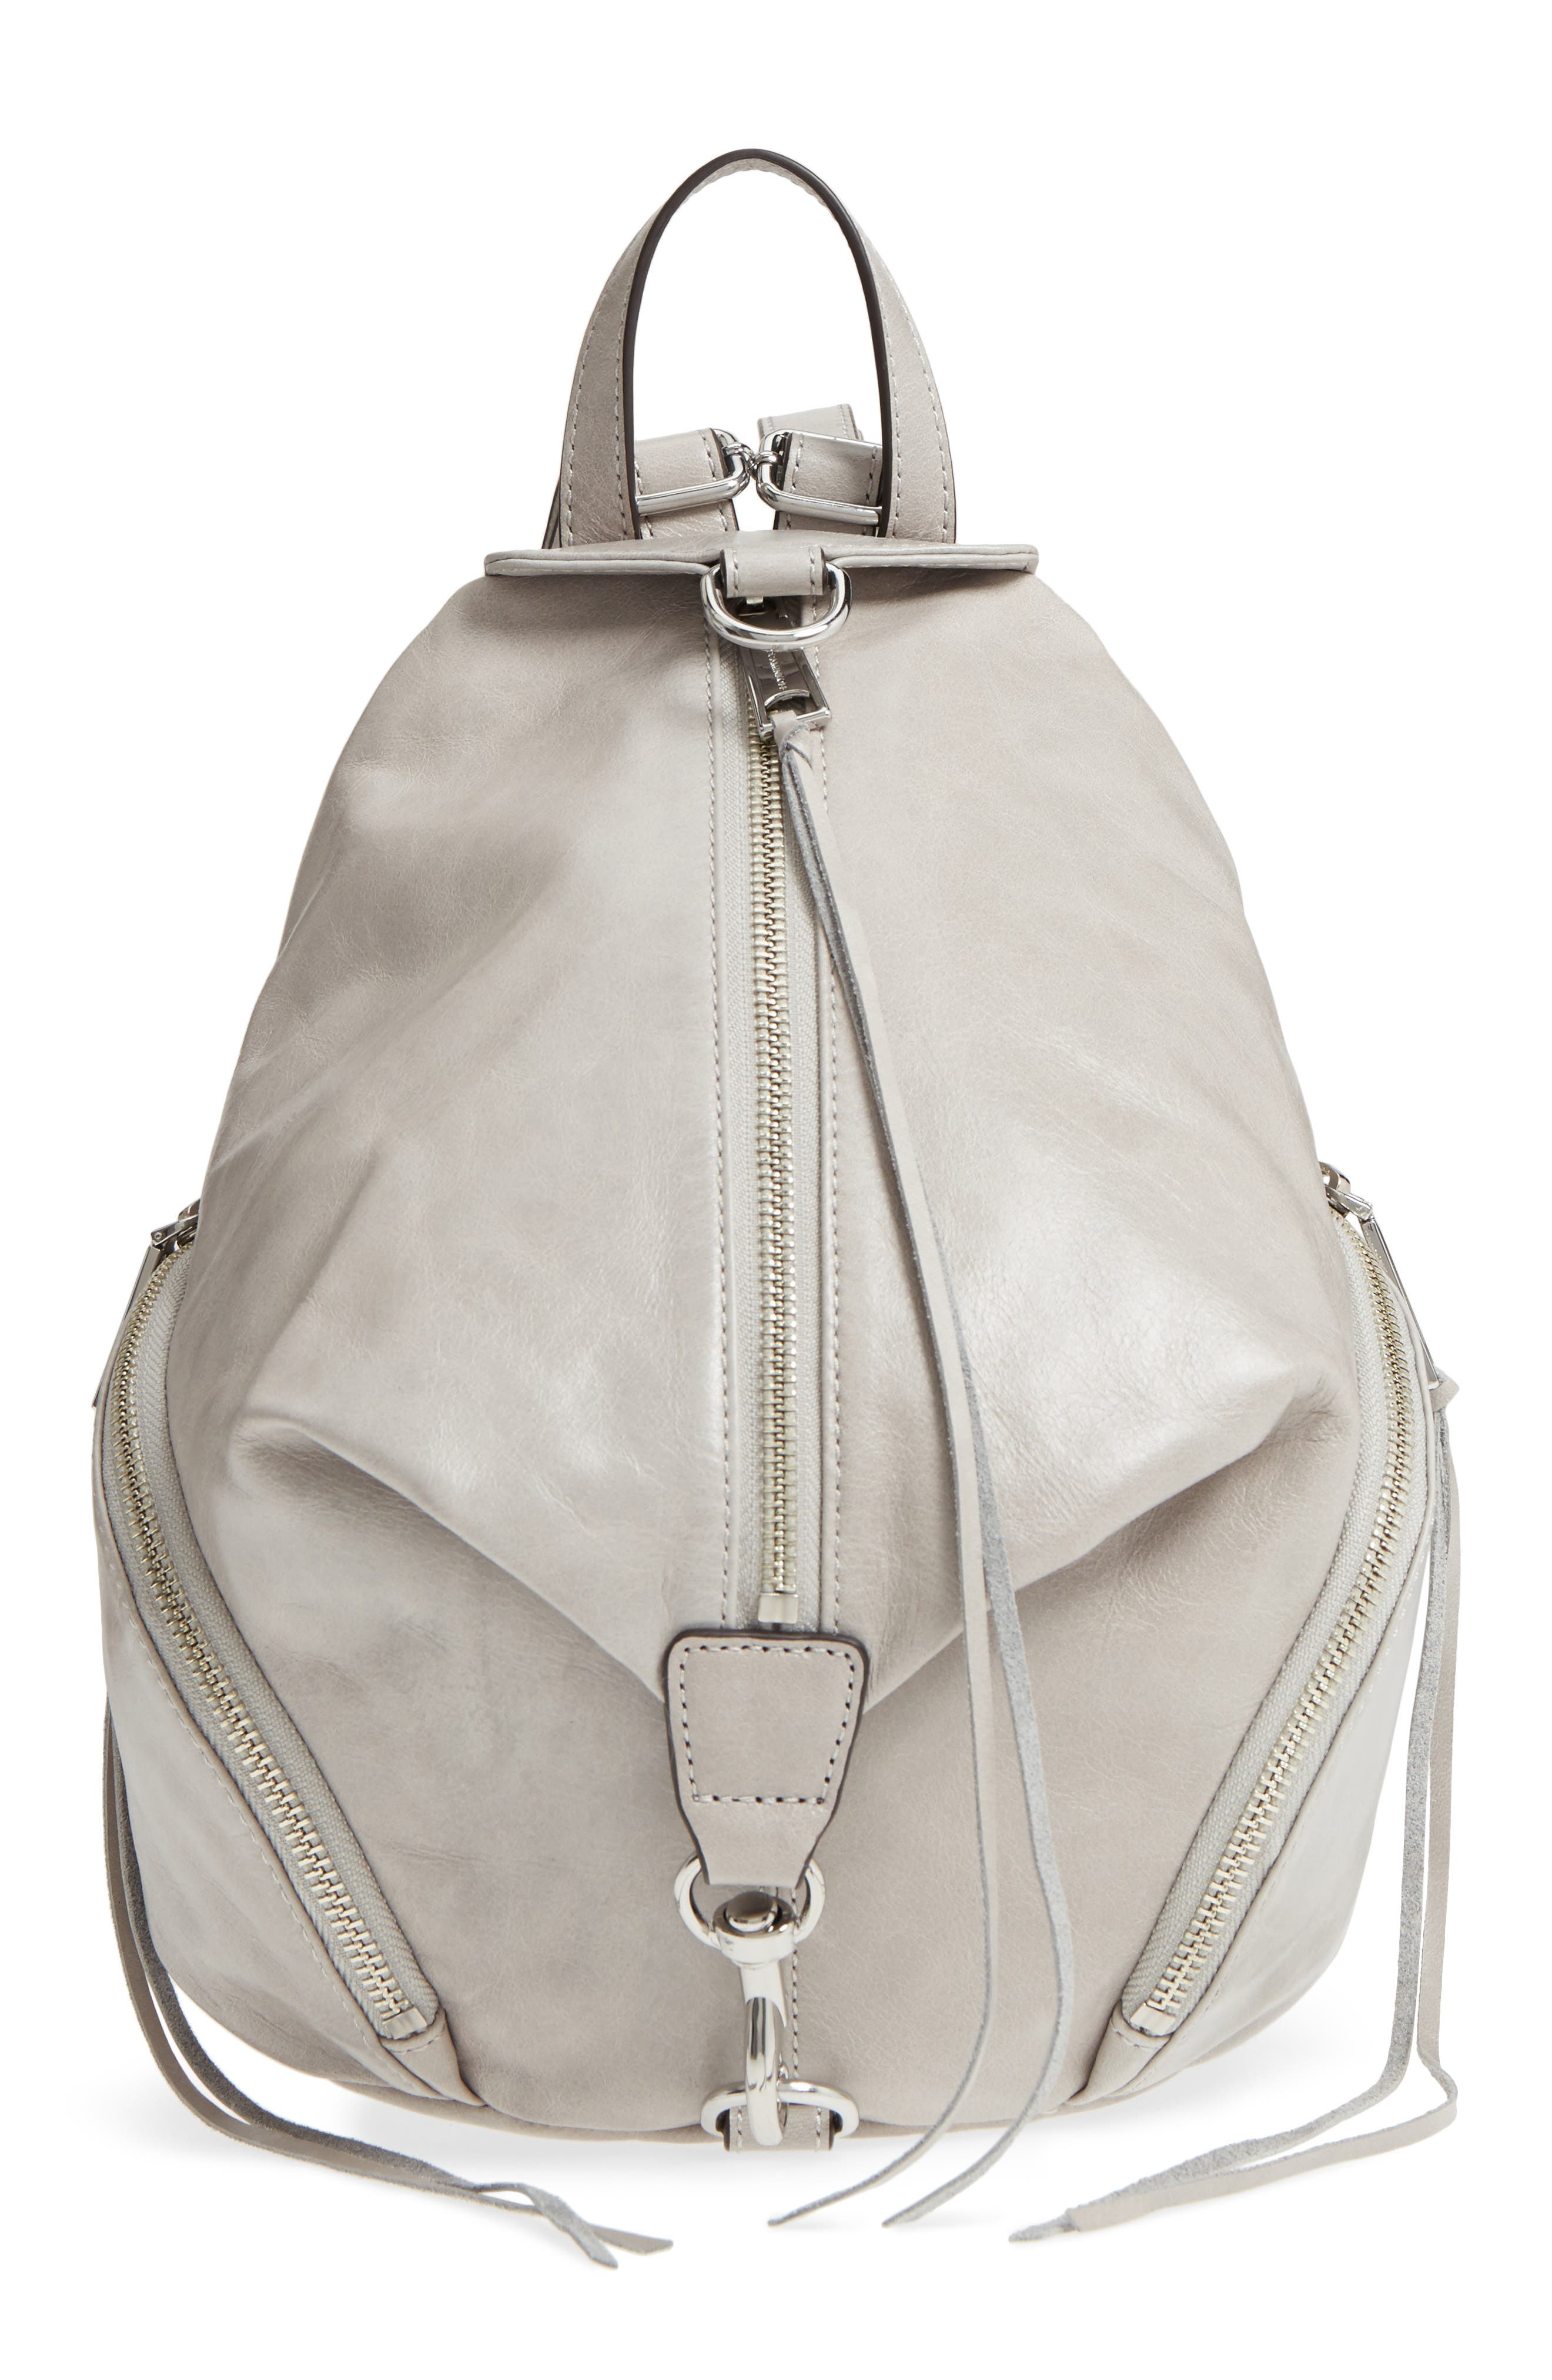 Medium Julian Leather Backpack,                             Main thumbnail 1, color,                             090